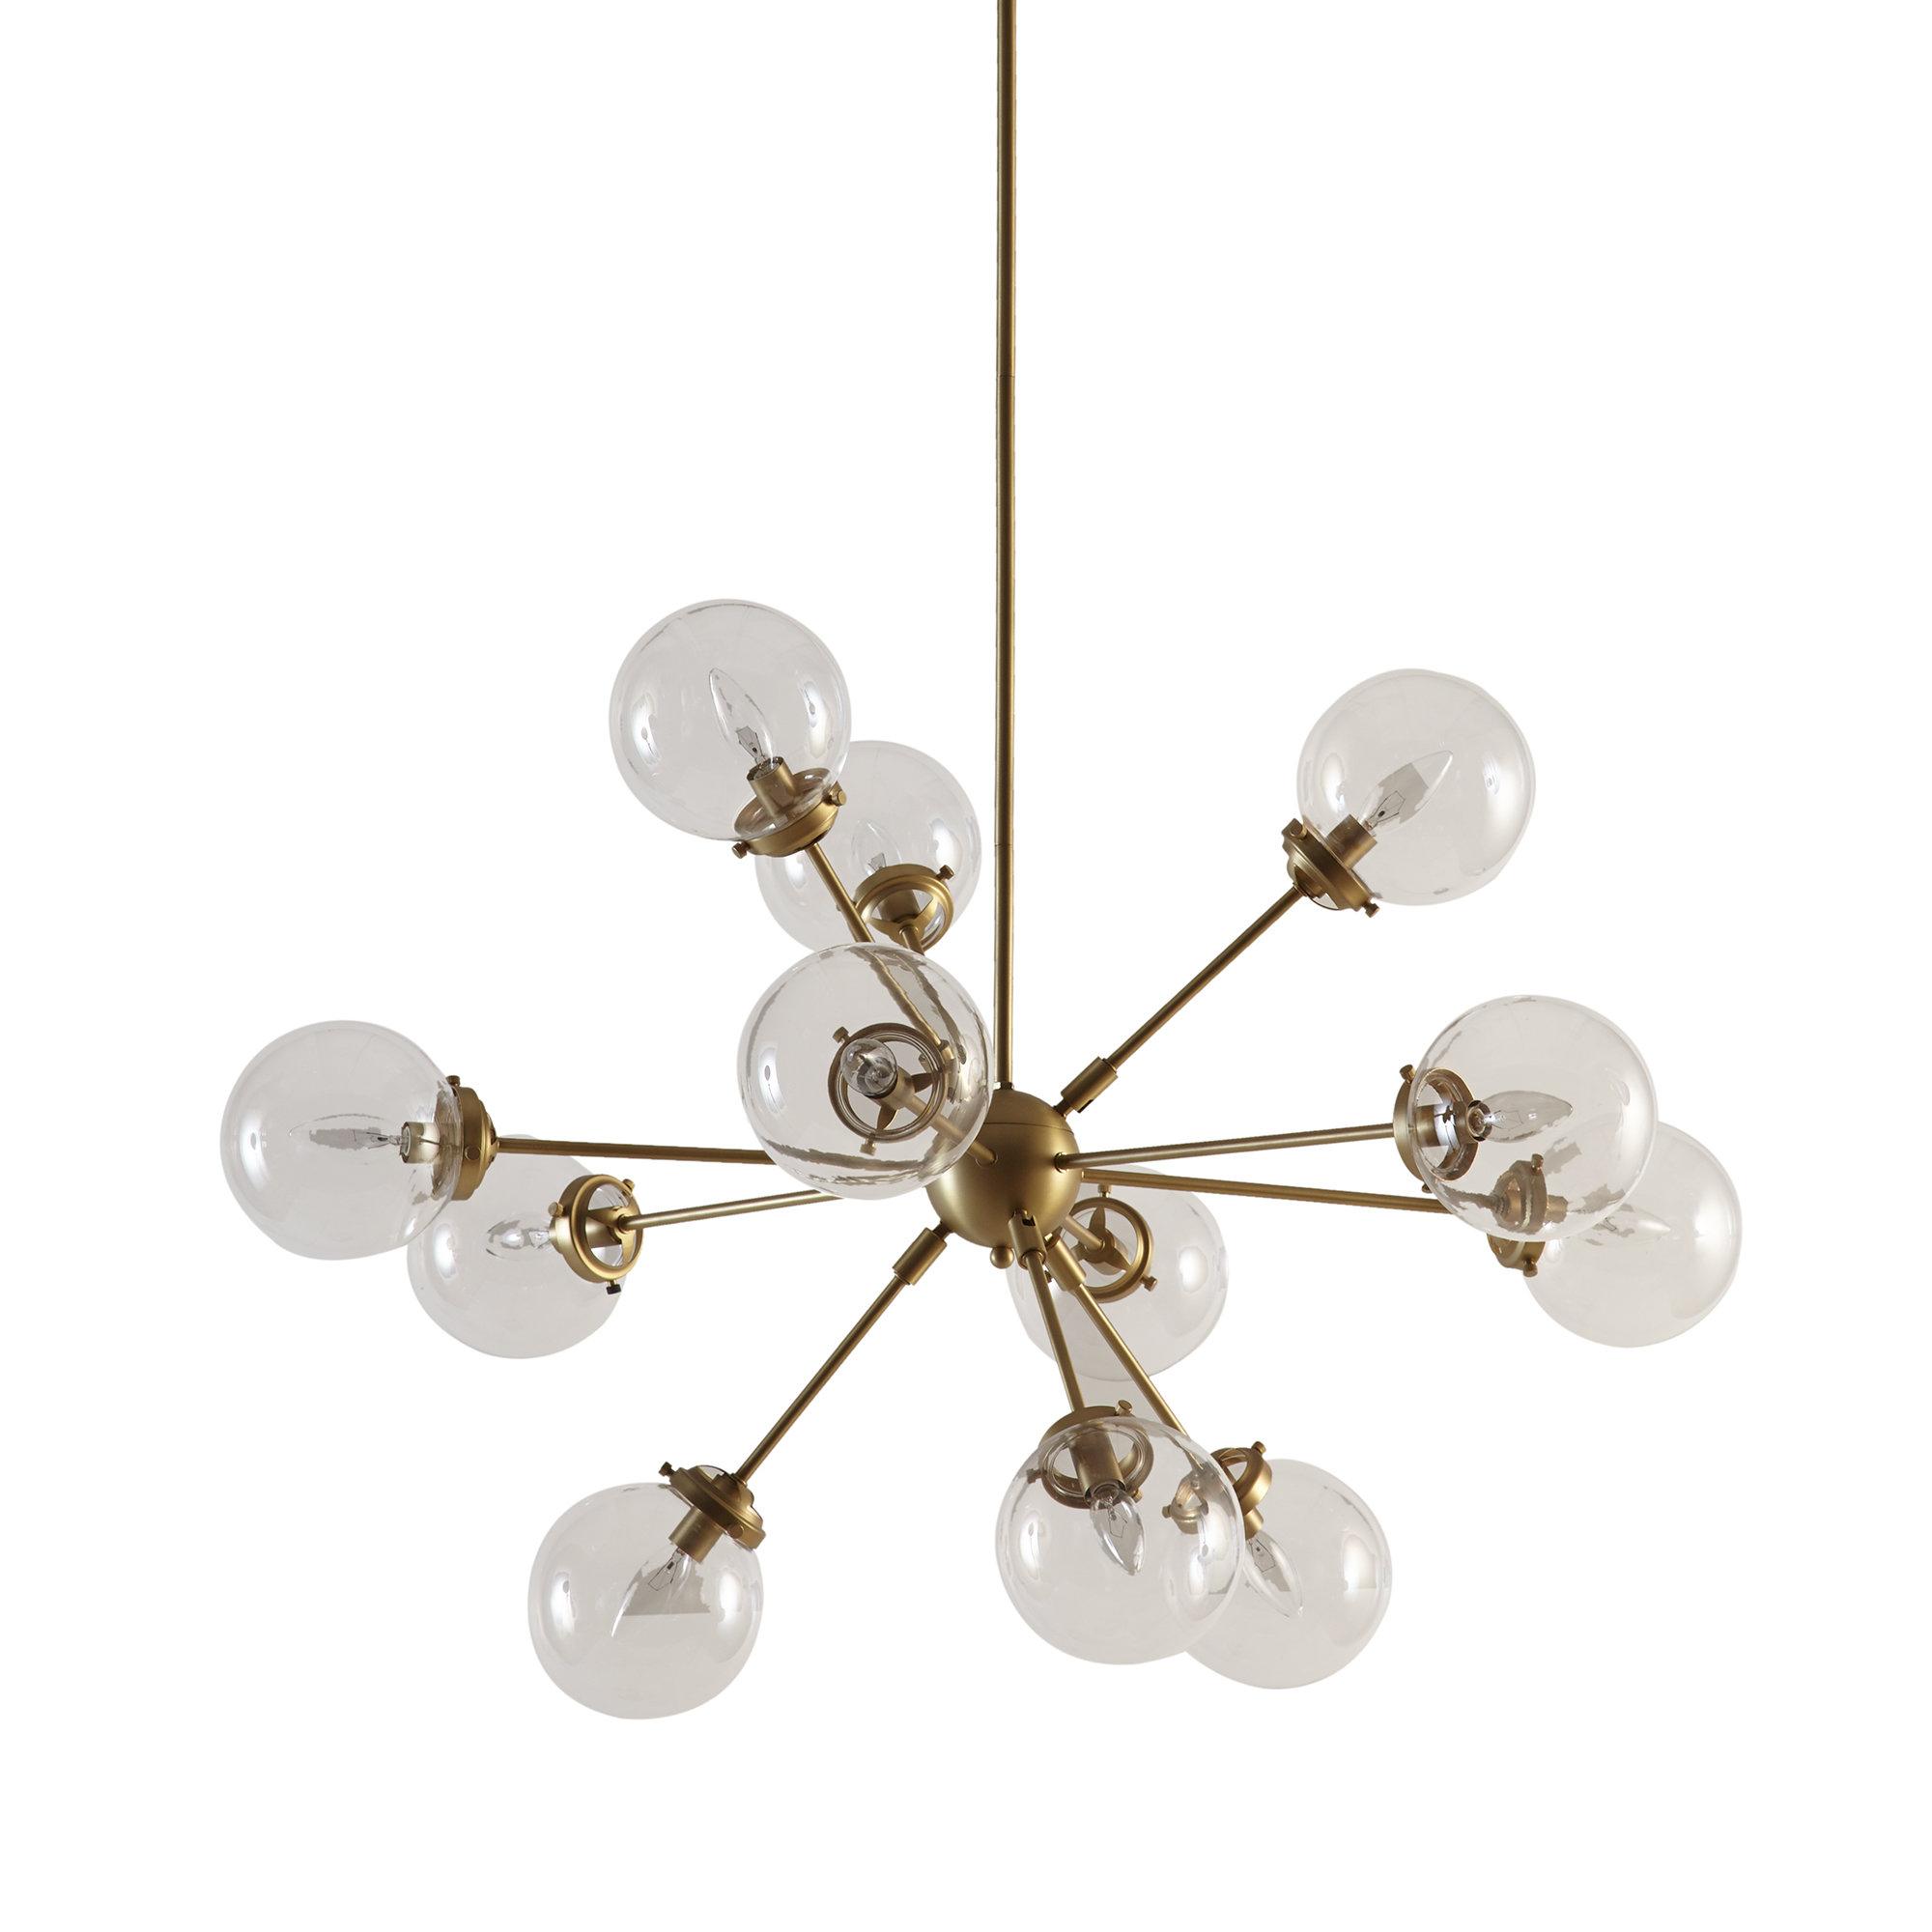 Asher 12 Light Sputnik Chandelier With Regard To Widely Used Bautista 6 Light Sputnik Chandeliers (View 1 of 20)